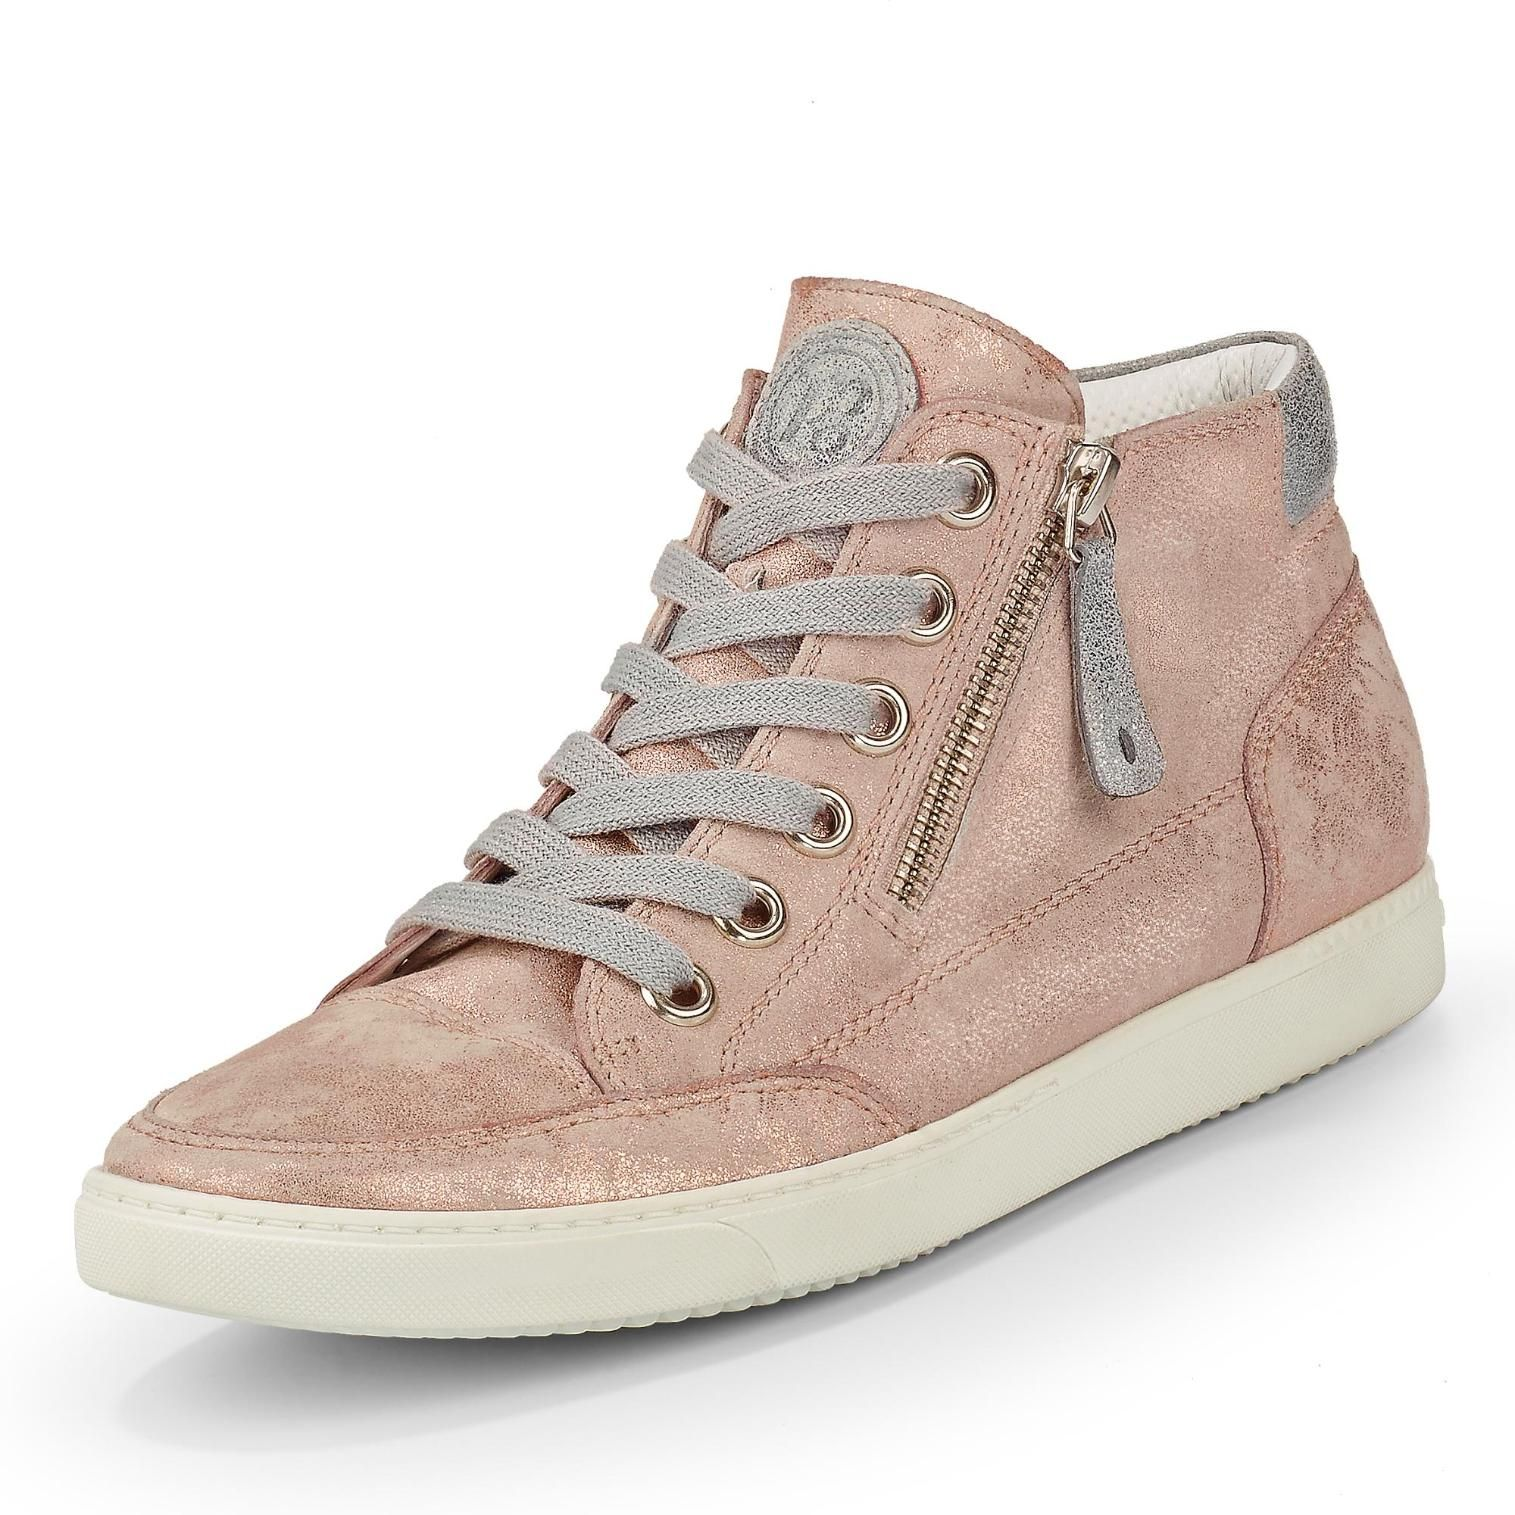 Paul Green Sneaker für nur 145,00€ (12.08.17) in Farbe rosé